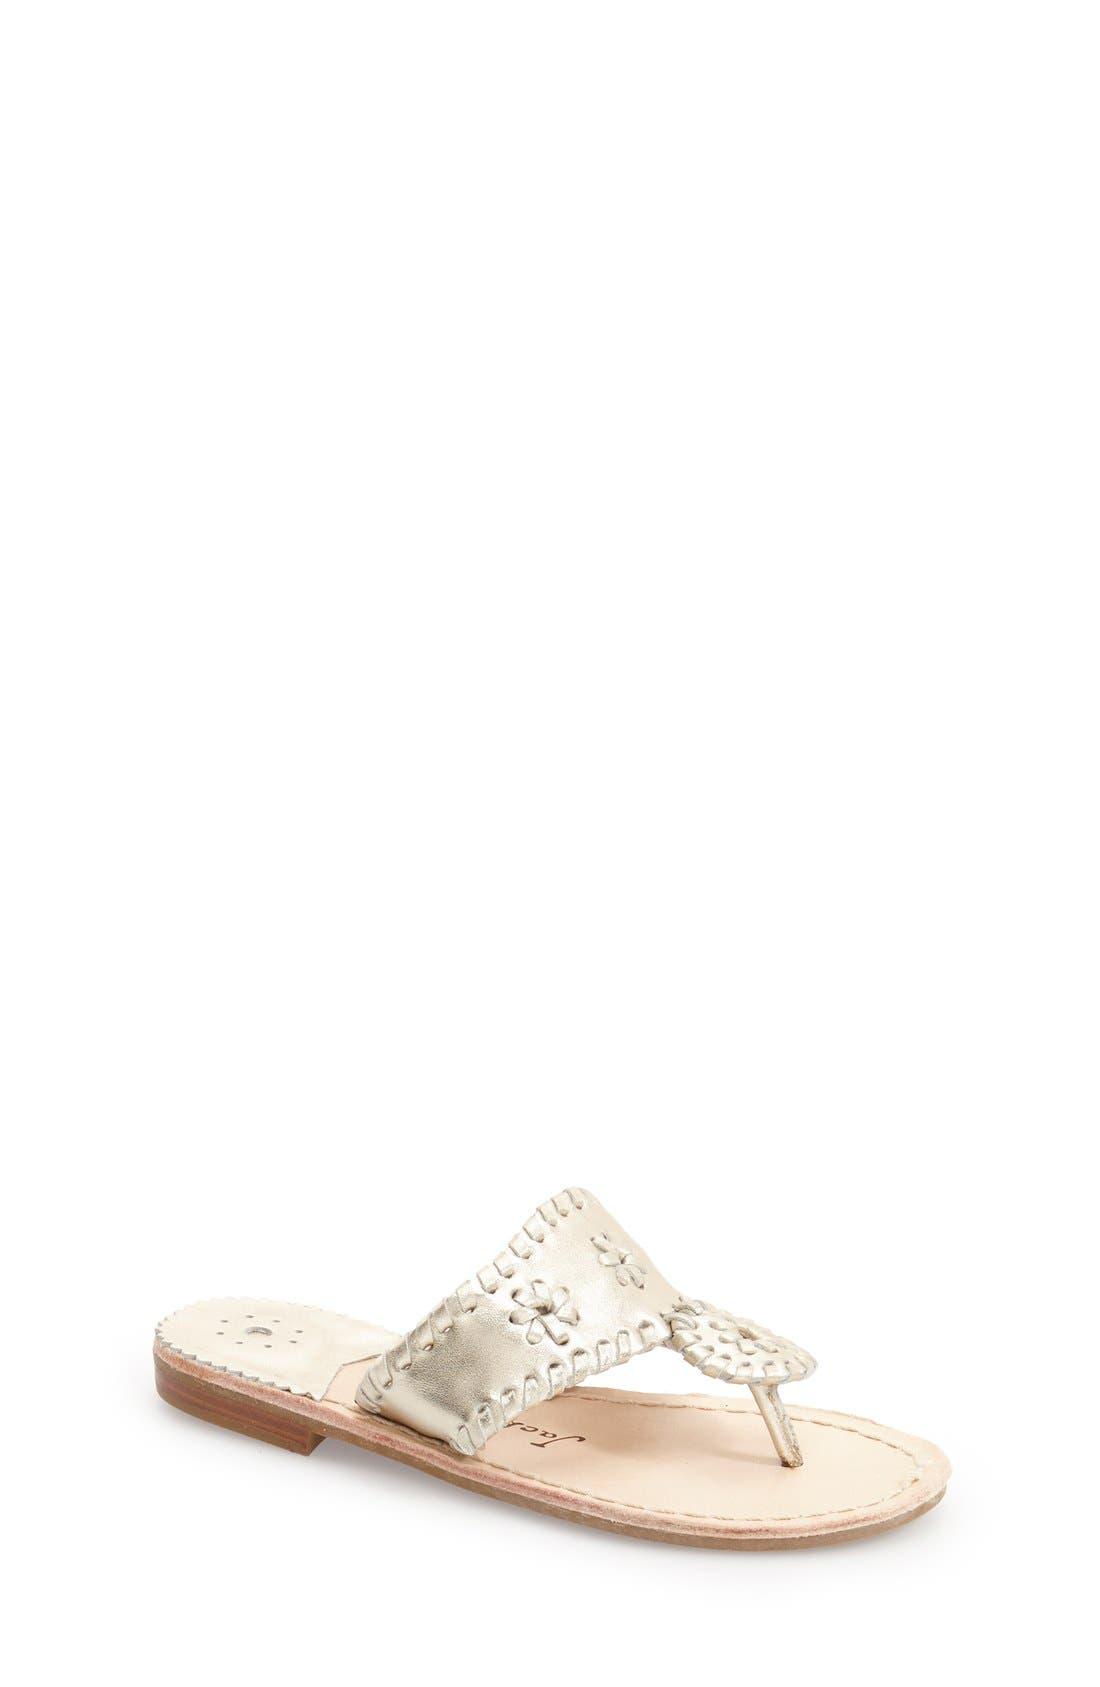 JACK ROGERS 'Miss Hamptons' Sandal